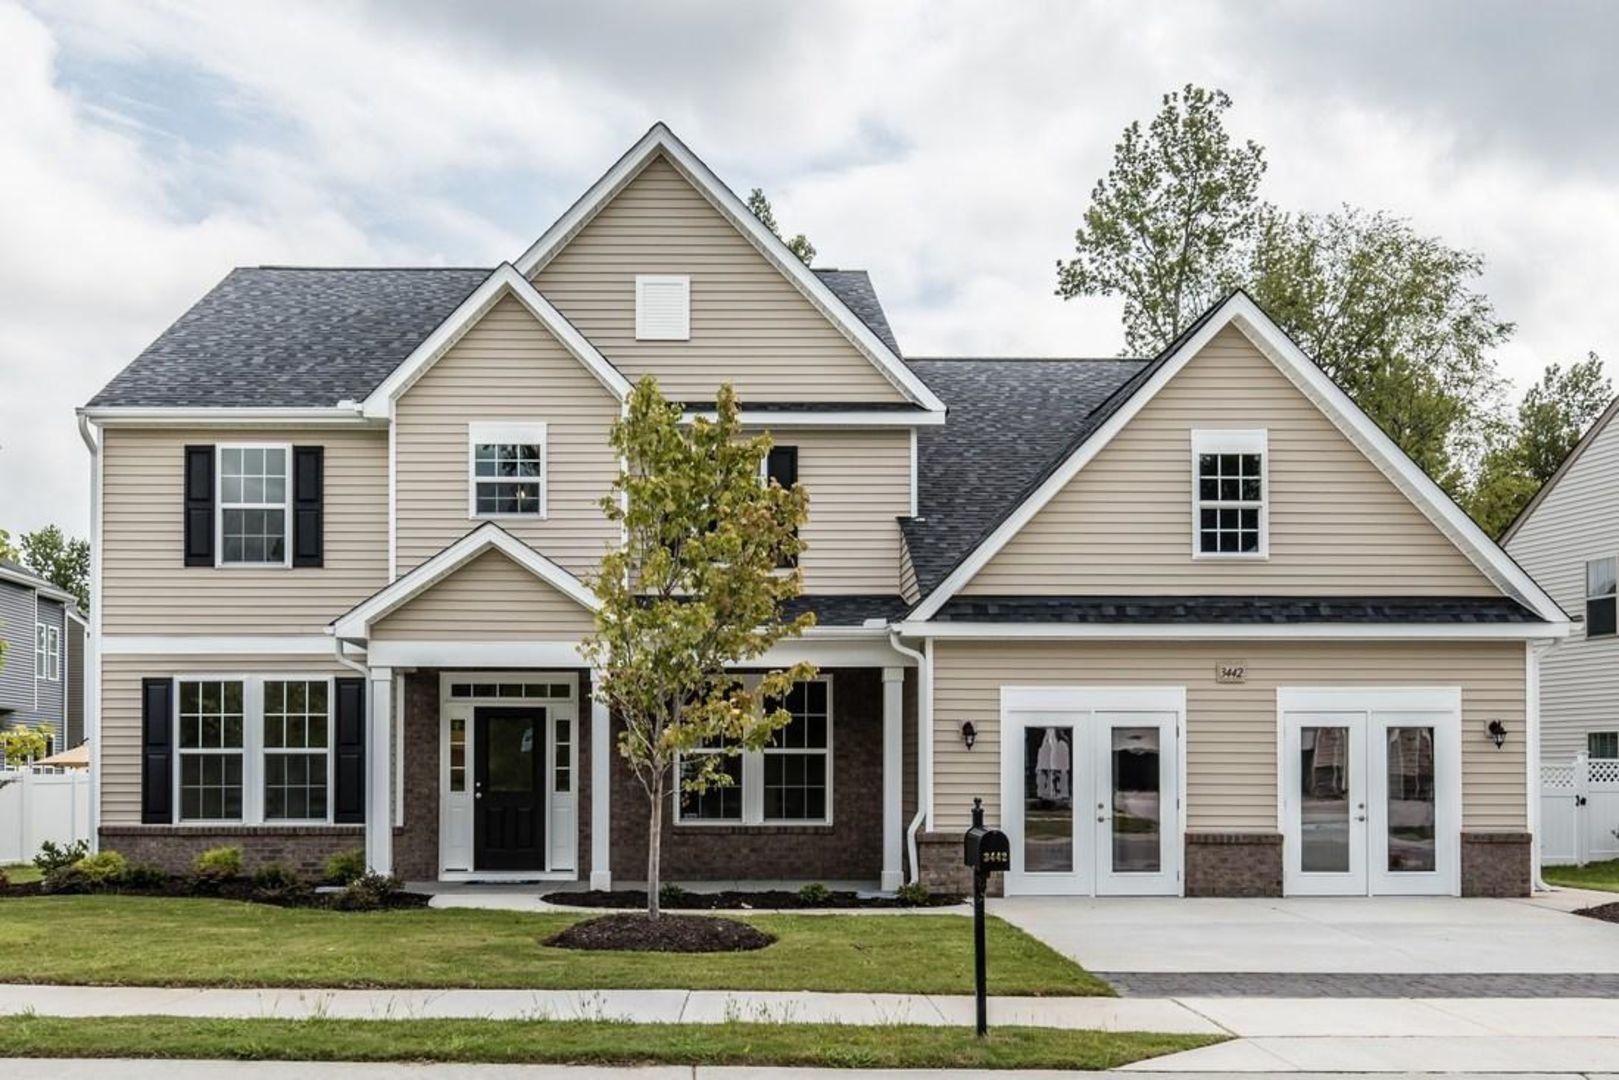 3442 grosbeak way raleigh nc new home for sale